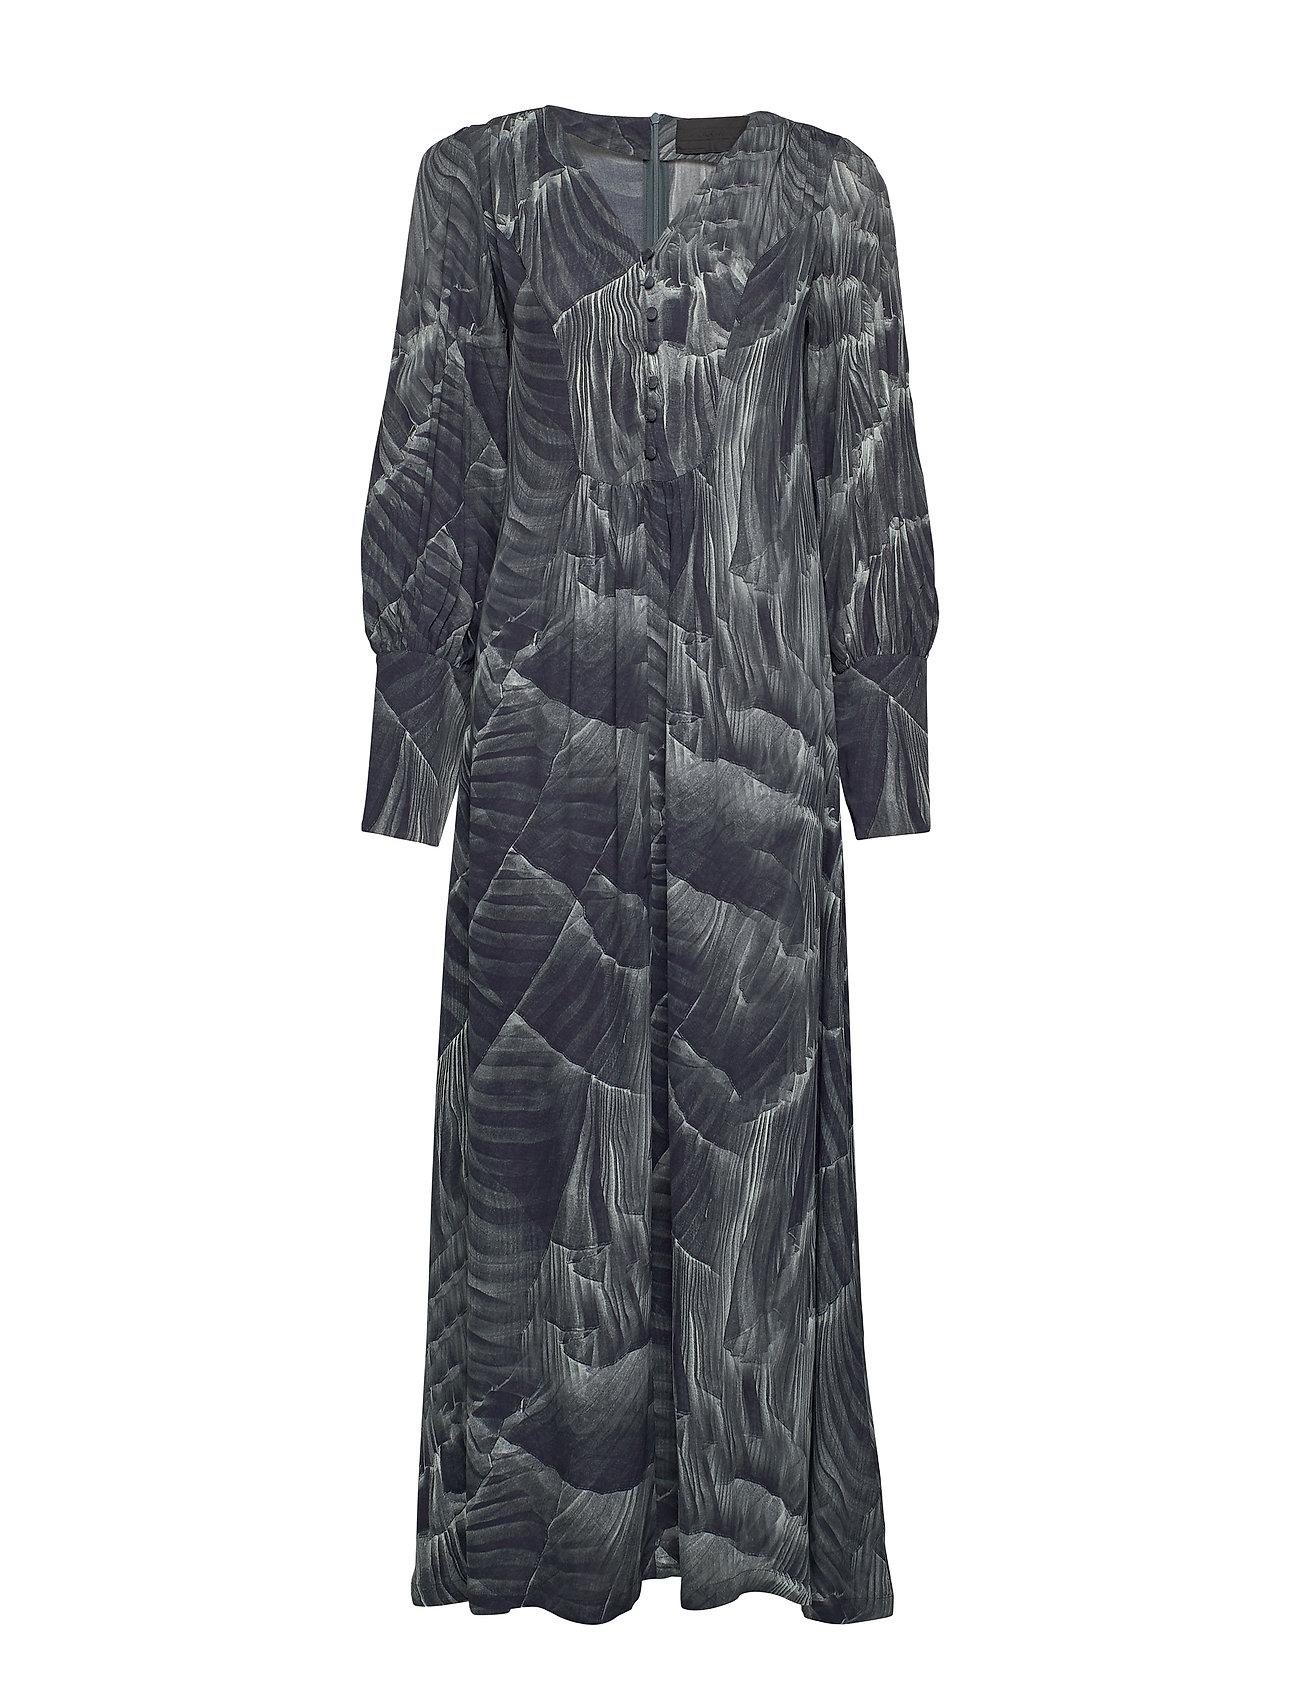 Diana Orving Maxi dress - PRINT PLEAT (GREY)